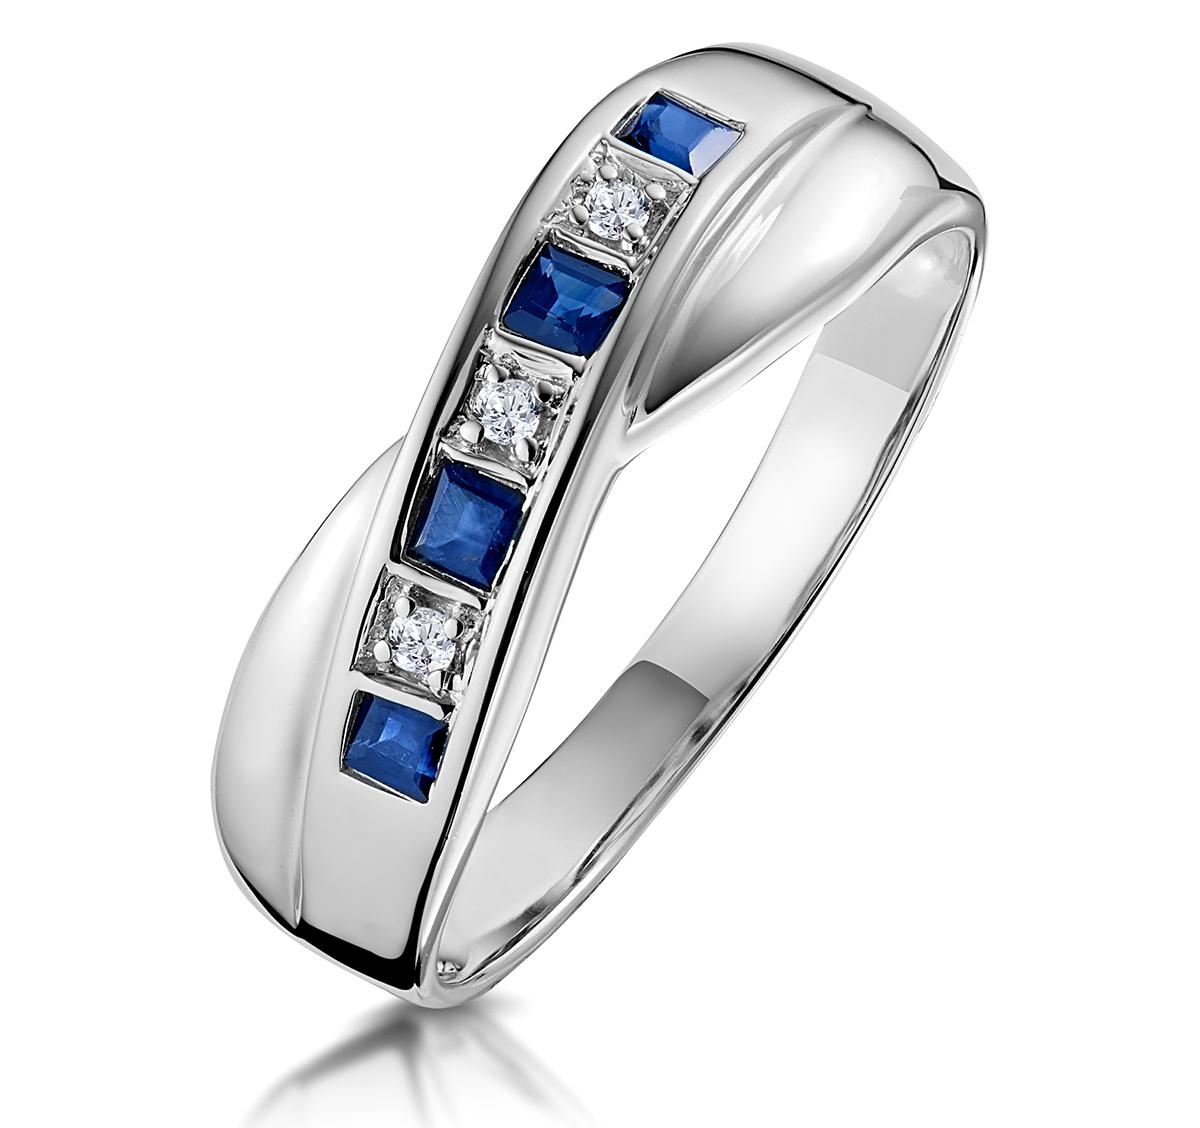 SAPPHIRE 0.45CT AND DIAMOND 9K WHITE GOLD RING